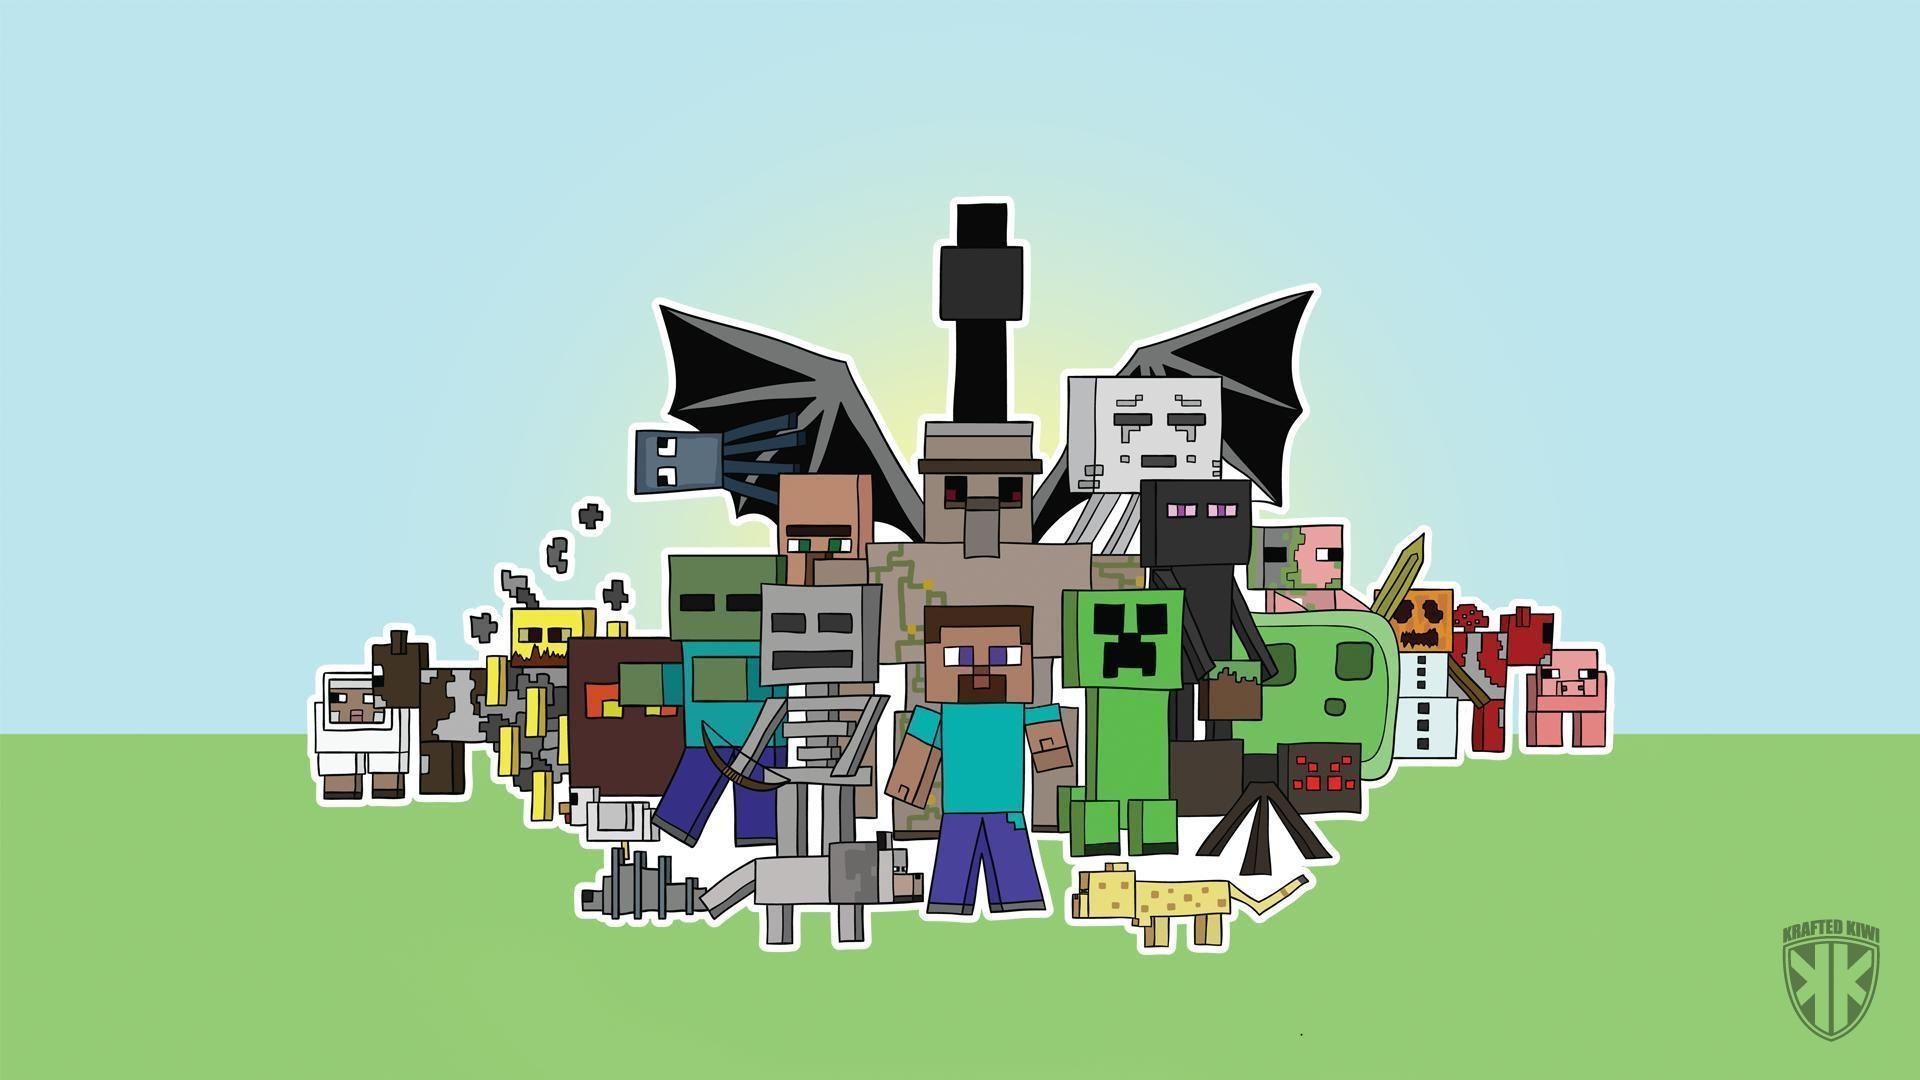 Minecraft Chicken Wallpapers Wallpaper Cave